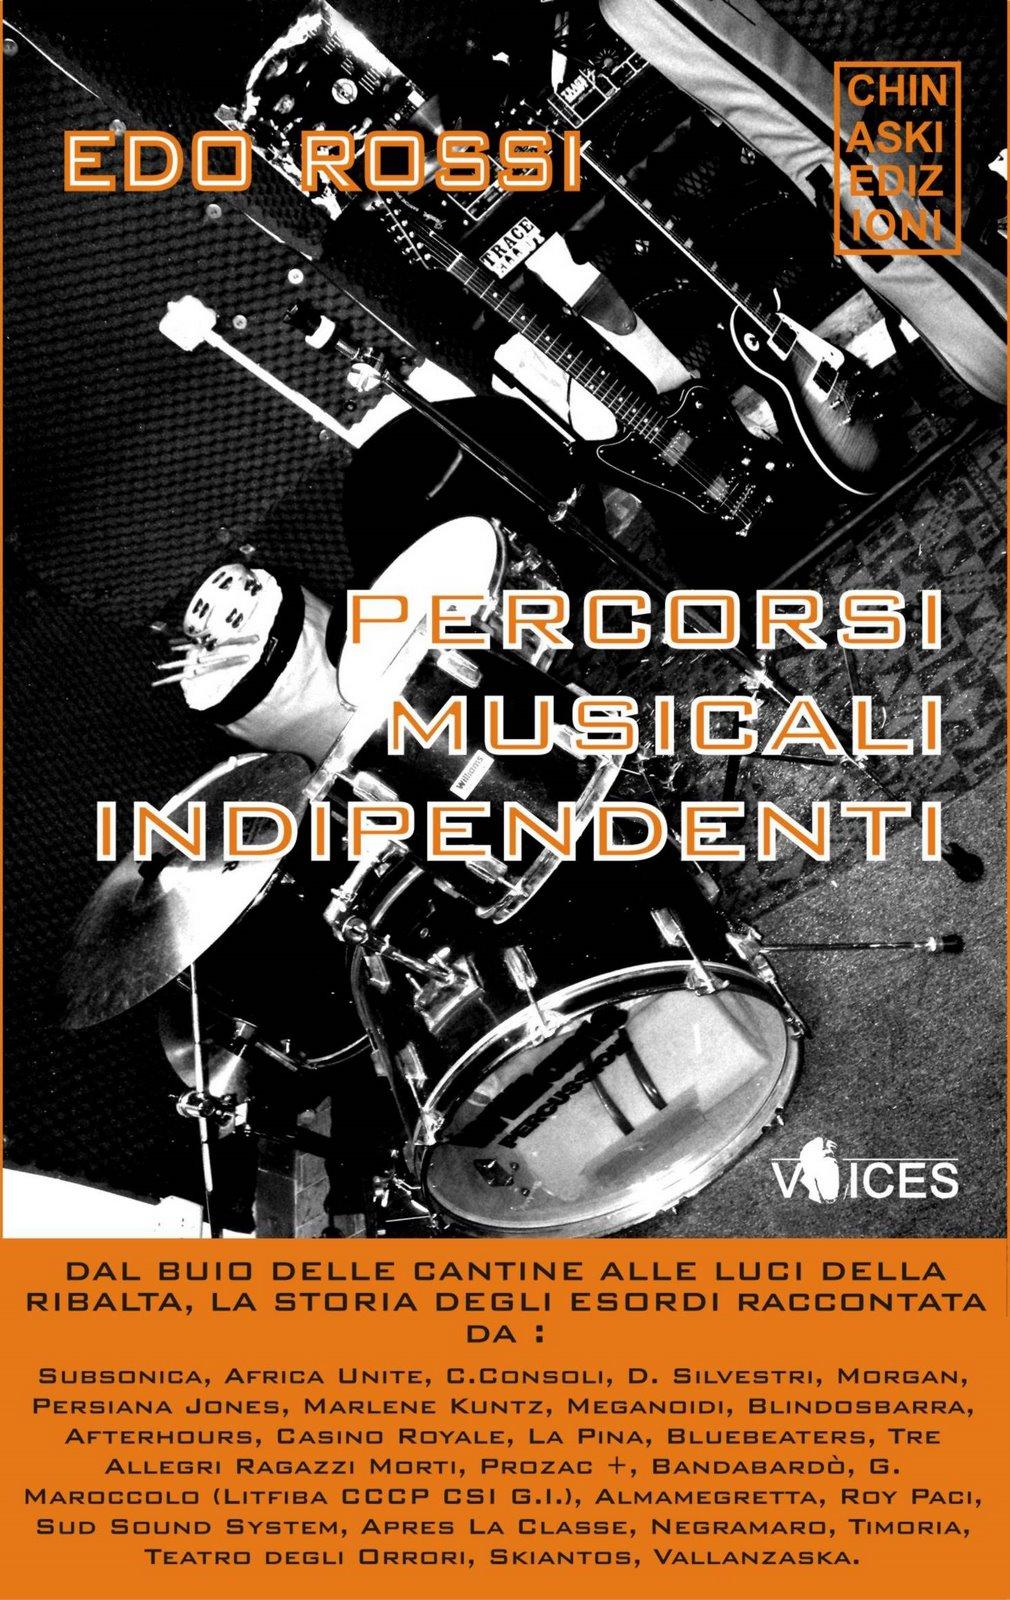 PERCORSI MUSICALI INDIPENDENTI copertina